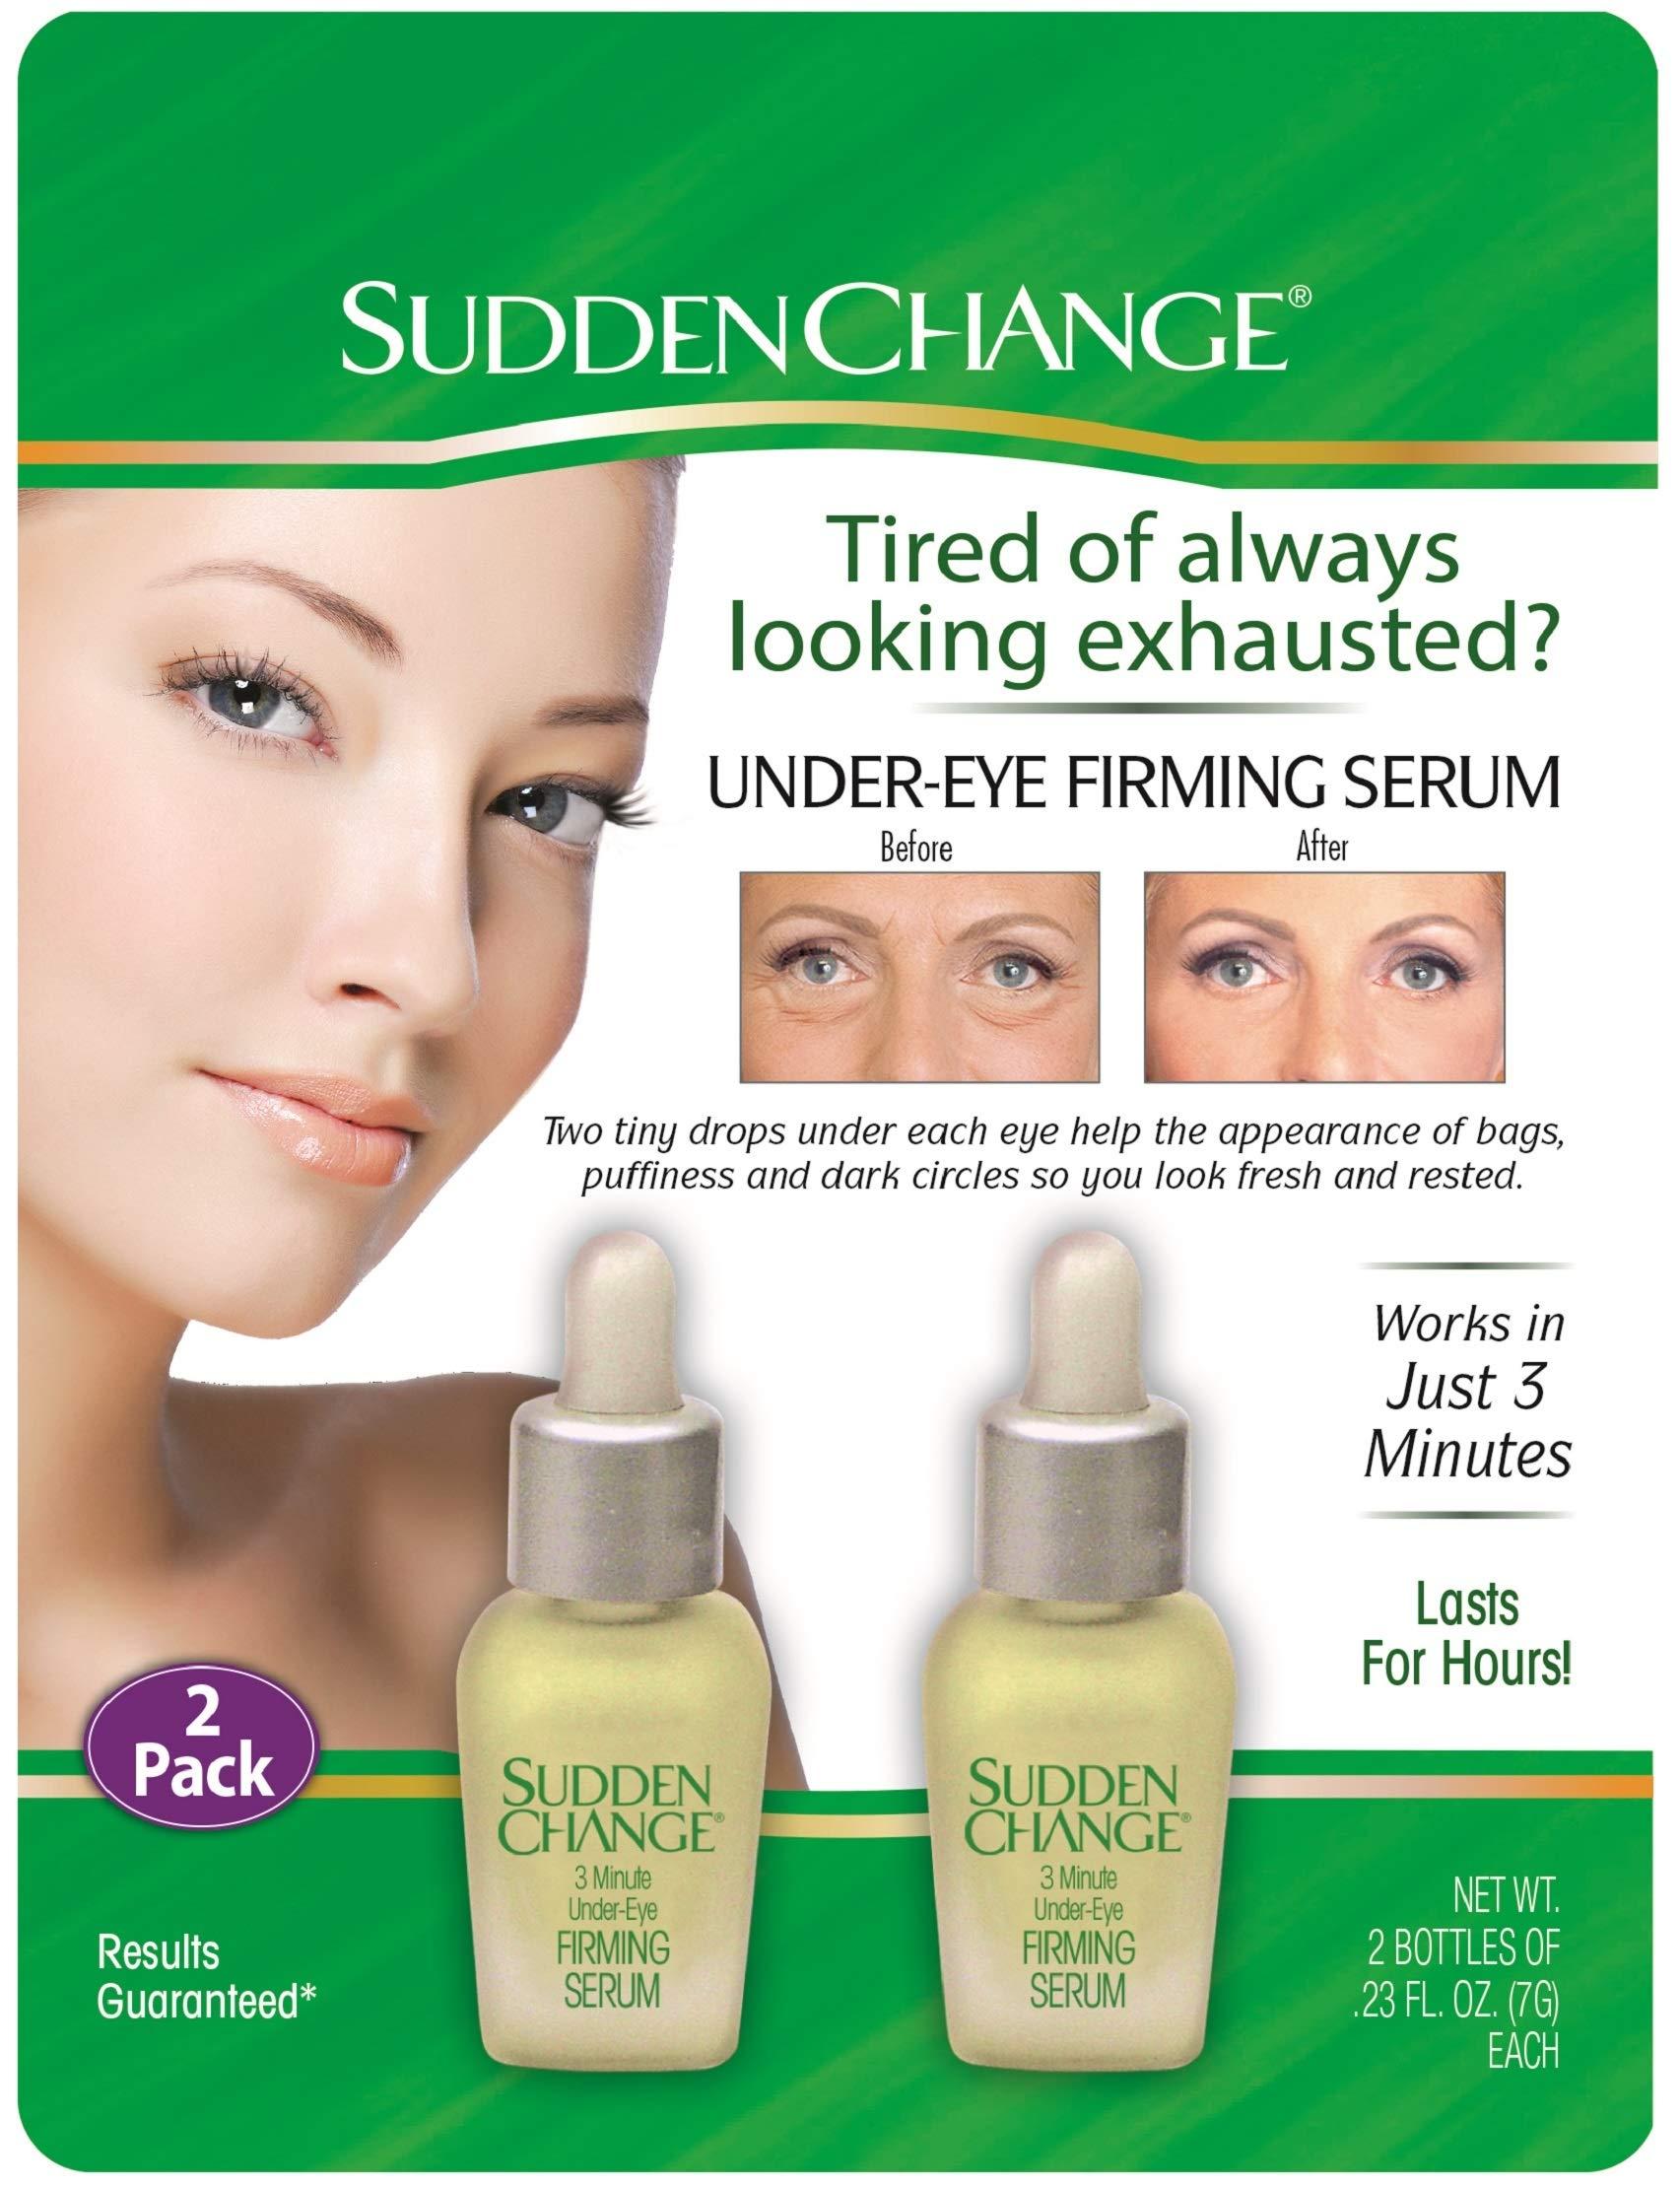 Sudden Change Under-Eye Firming Serum, 0.23 Ounce by Sudden Change